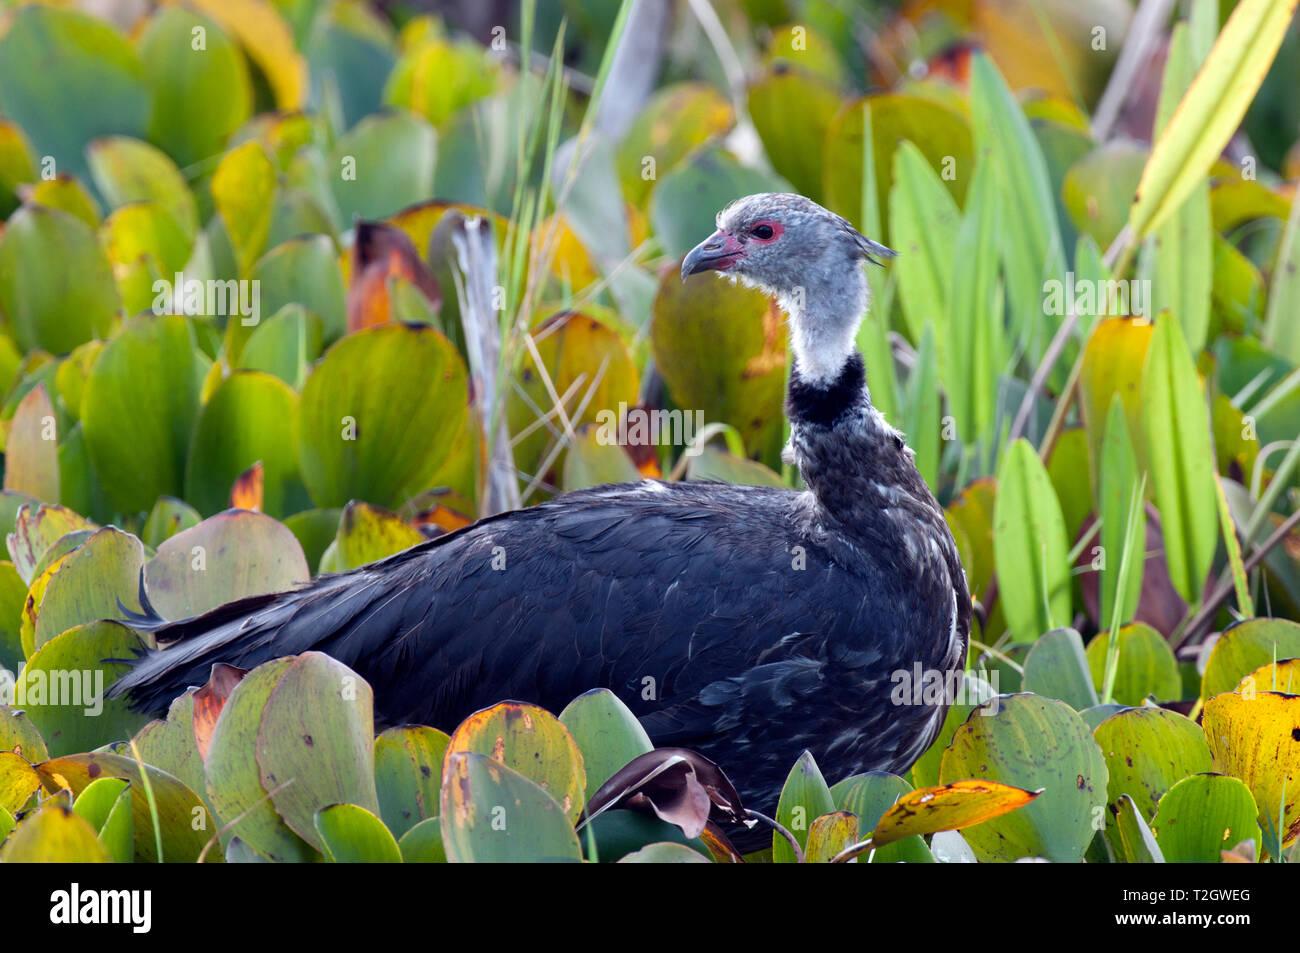 Southern screamer (Chauna torquata) in the Pantanal, Brazil - Stock Image